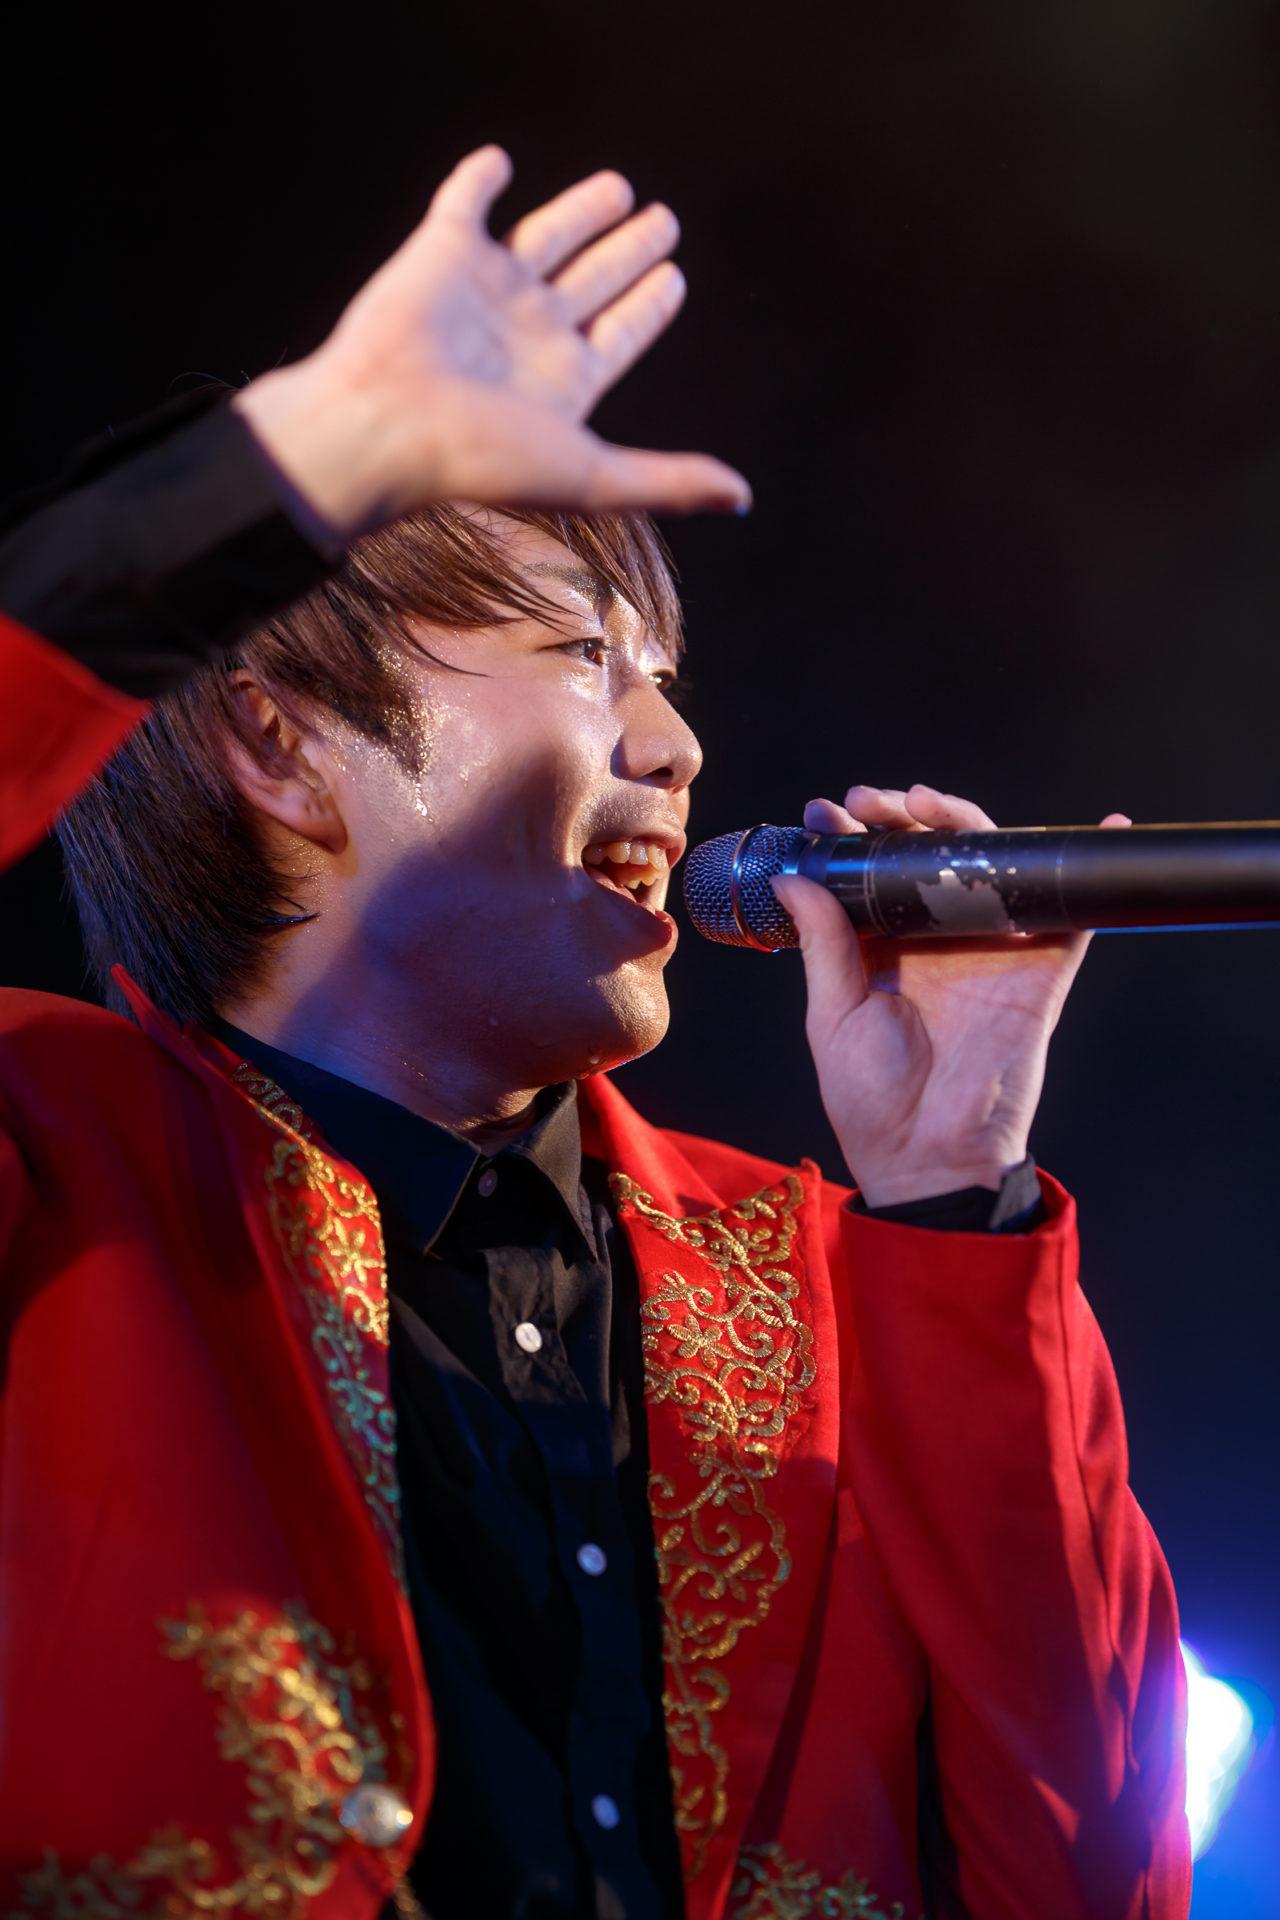 G.E.E.K RYO | 2017年ライブプロラストLIVE